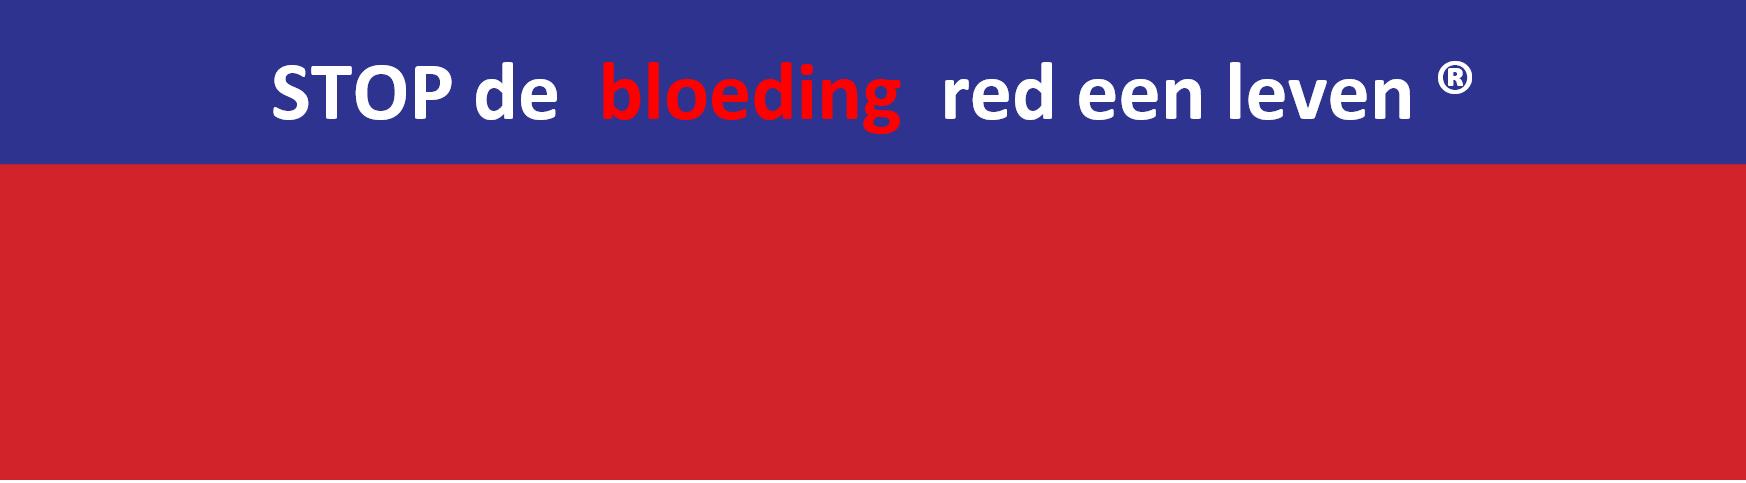 slider bloeding